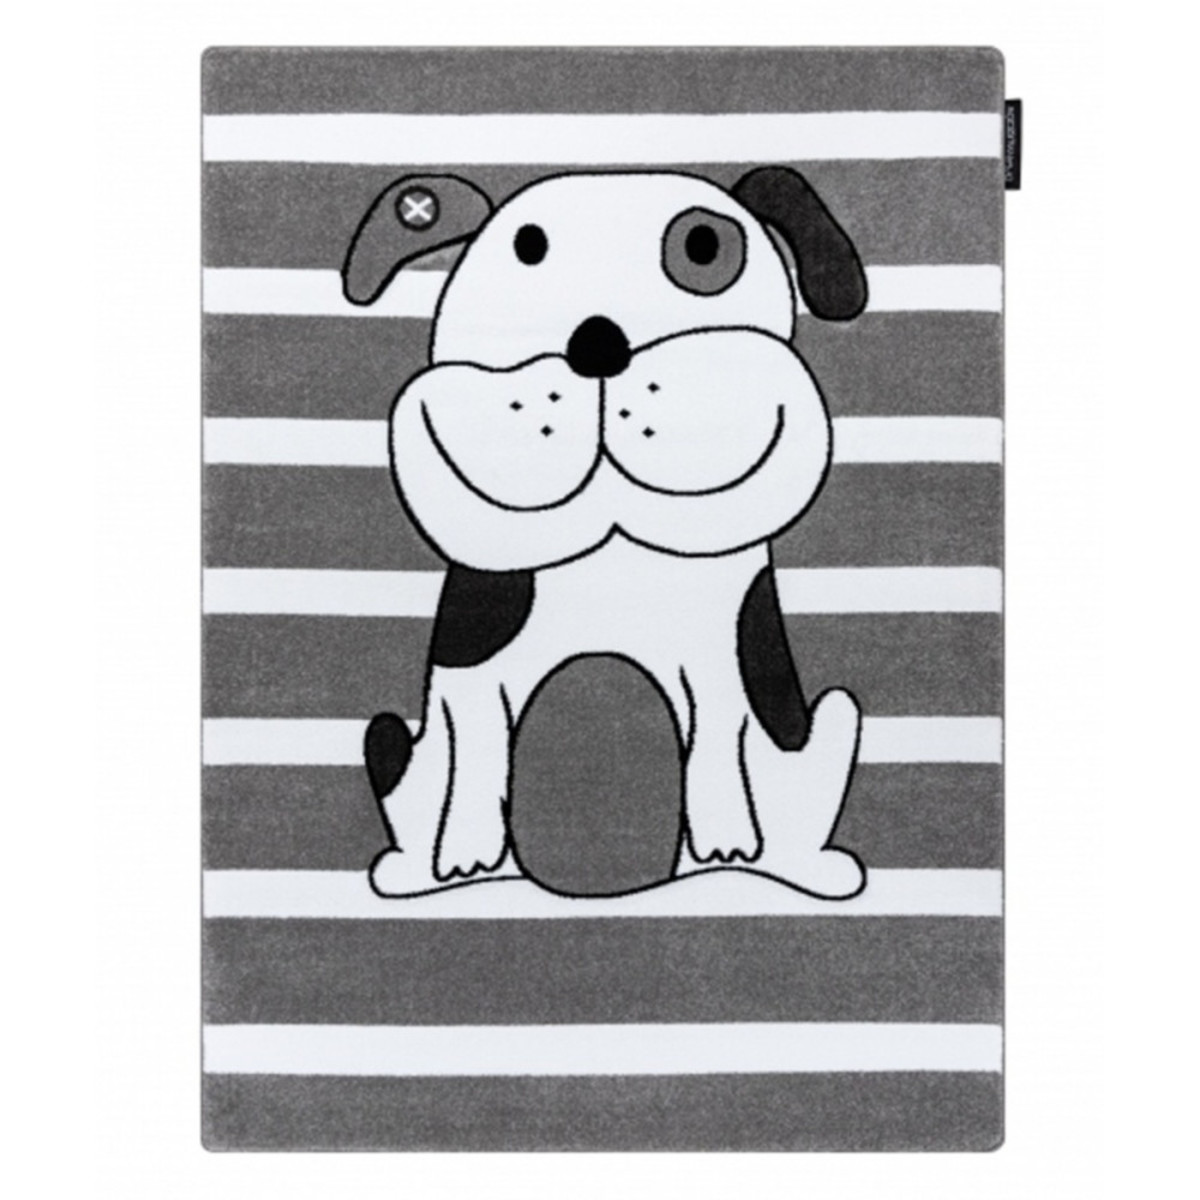 Detský koberec PETIT - Šteniatko - sivý Puppy rug - grey 120 x 170 cm